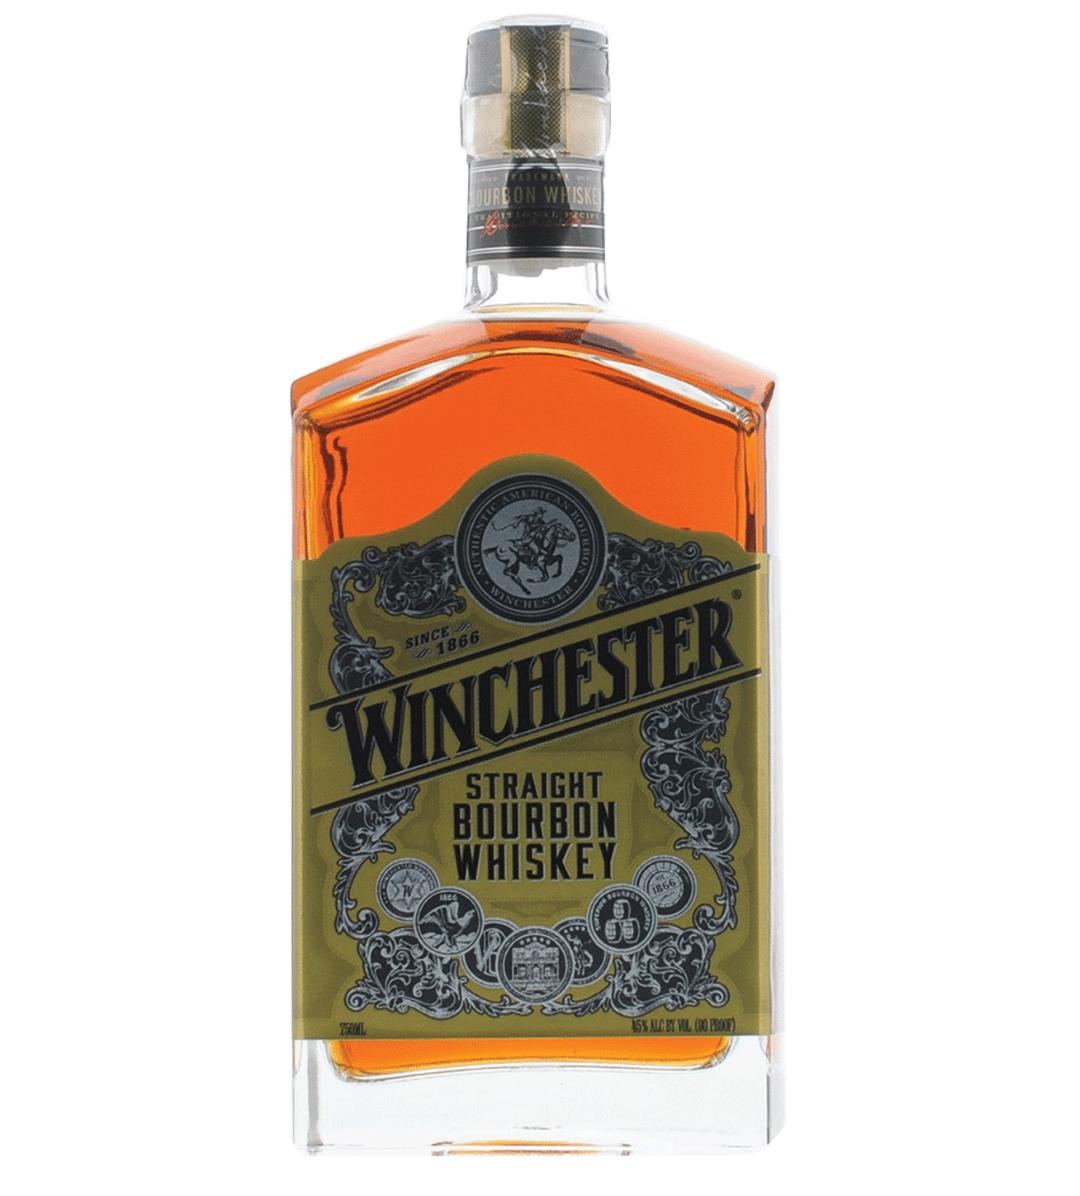 Winchester Straight Bourbon Whiskey